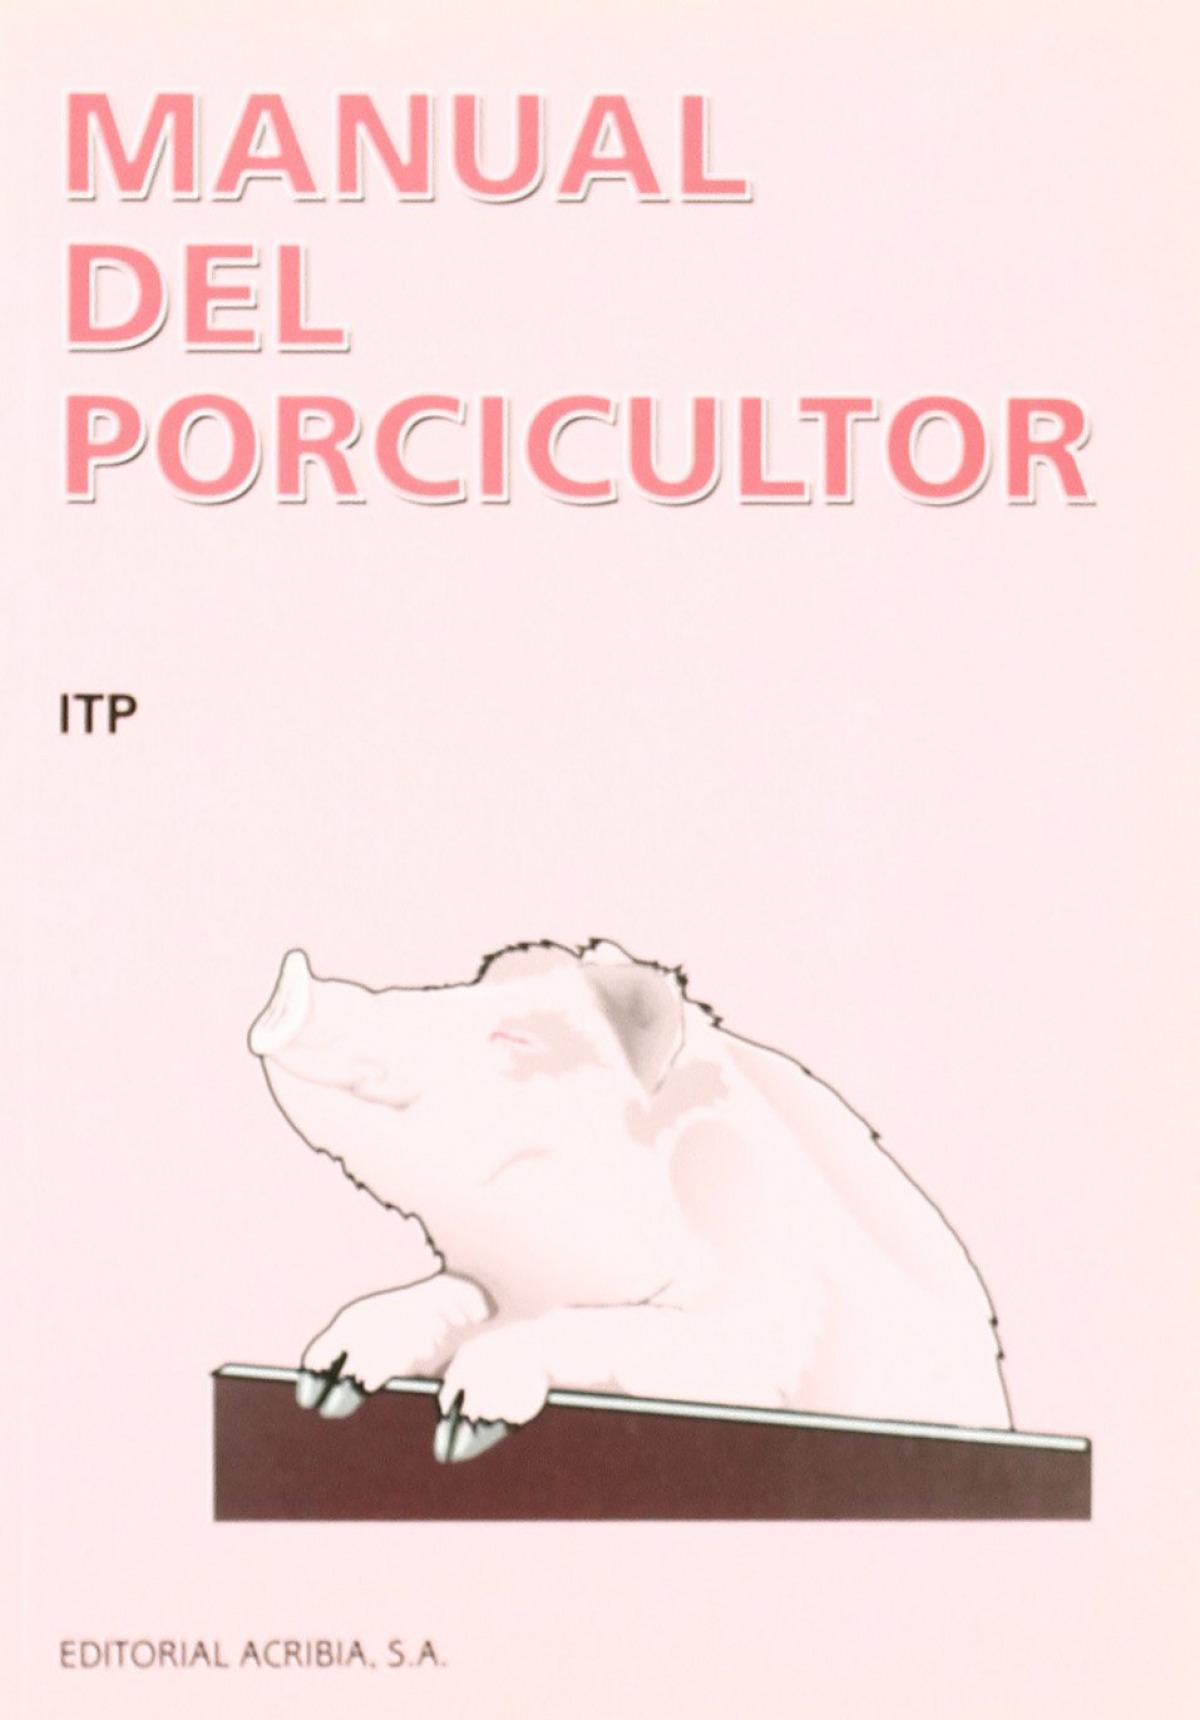 MANUAL DEL PORCICULTOR